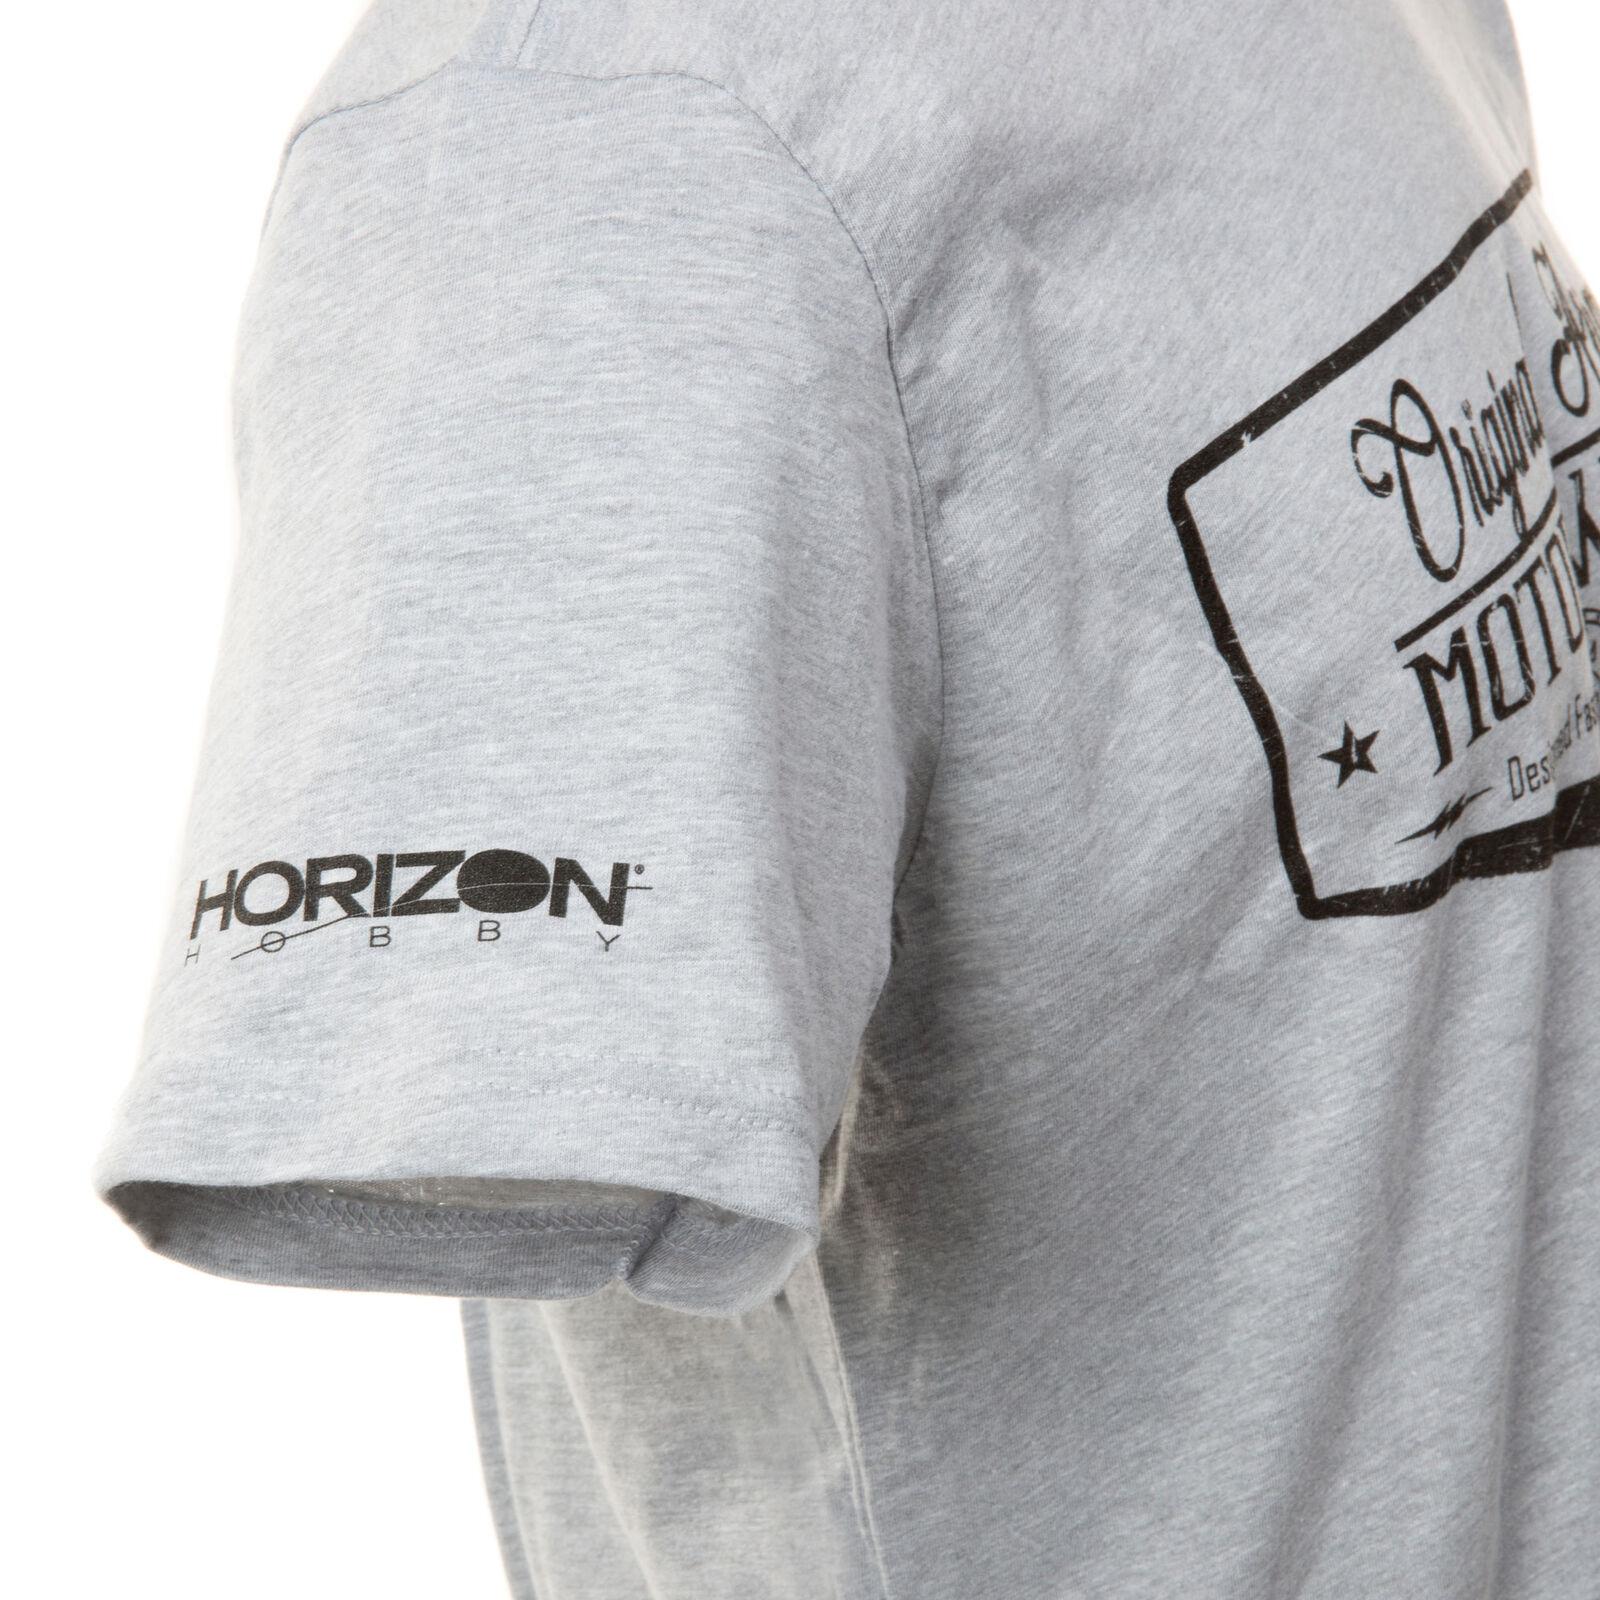 Motorworks T-Shirt, Medium